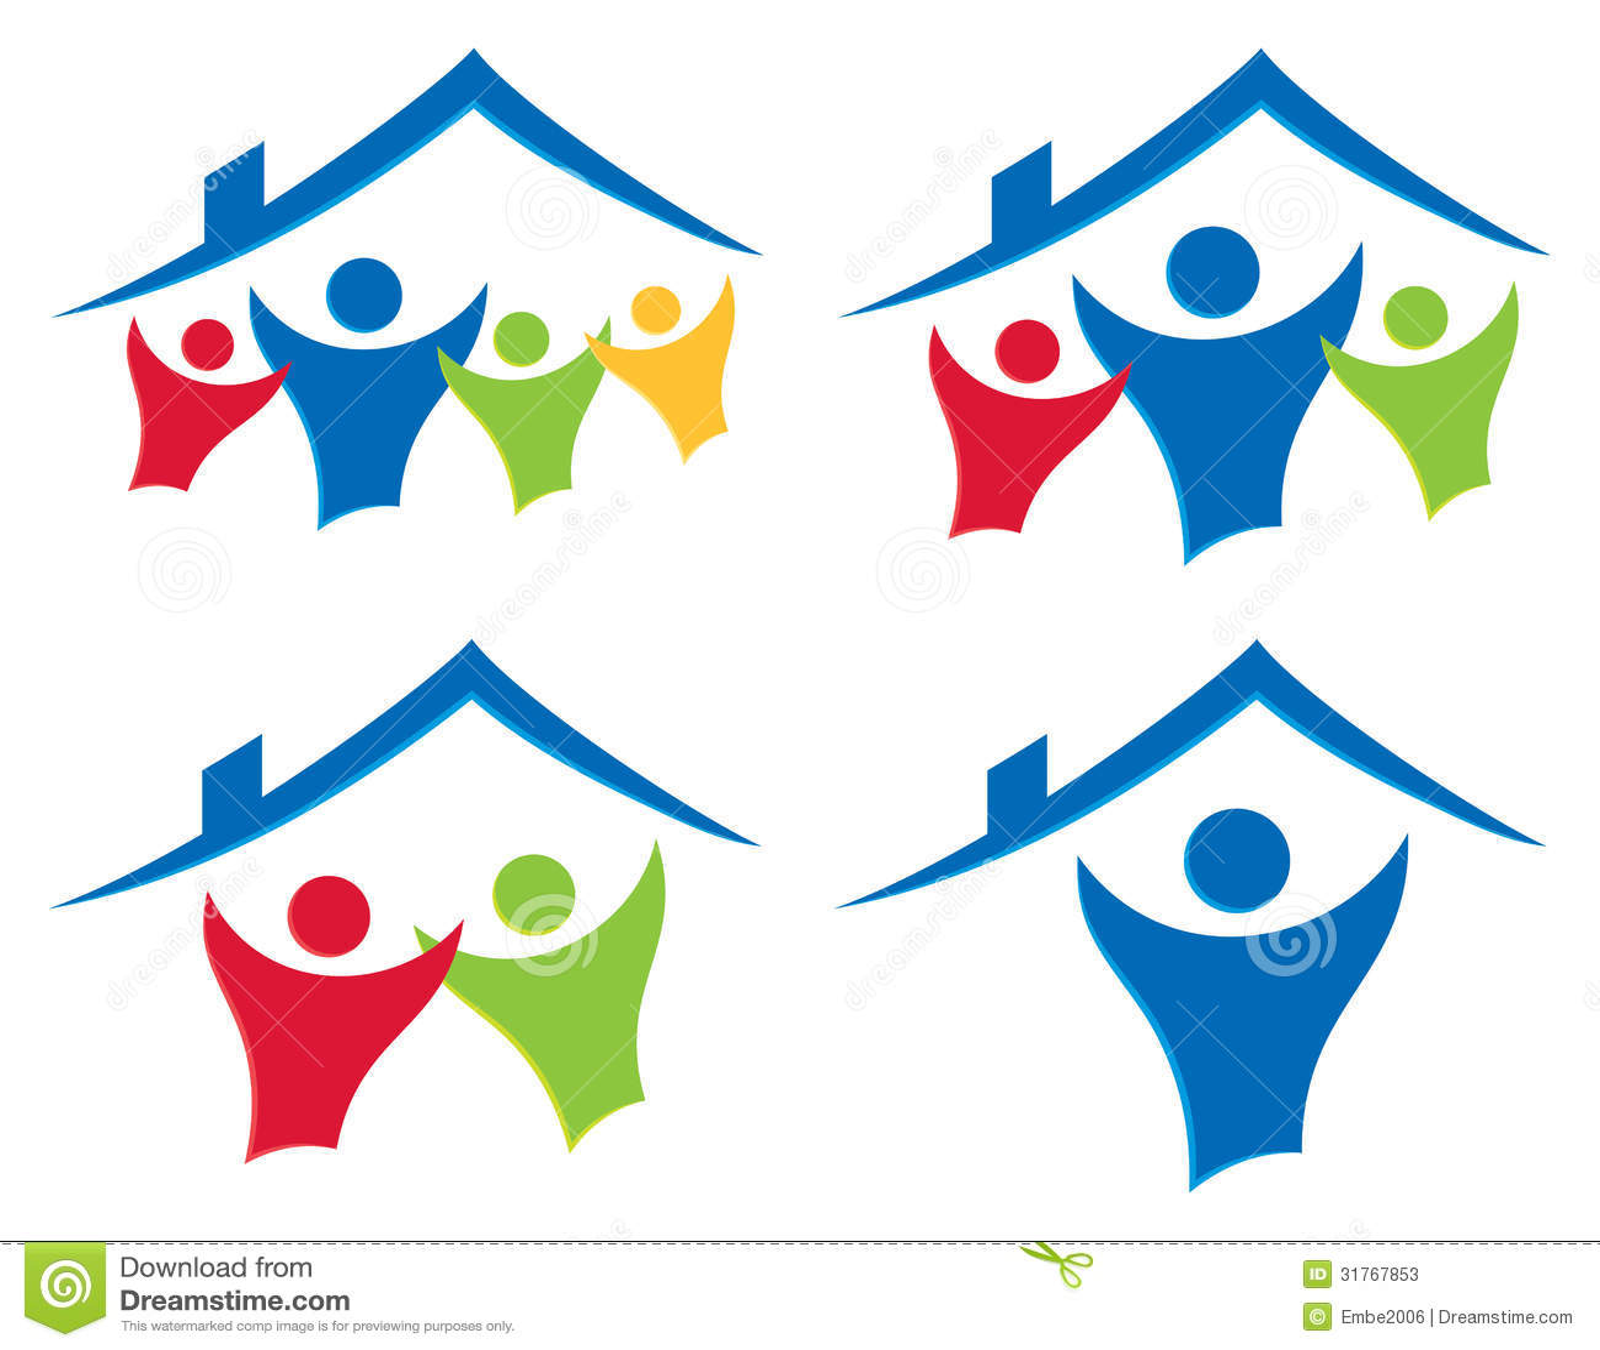 Casita House Plans People House Logo Set Stock Vector Illustration Of Dwell